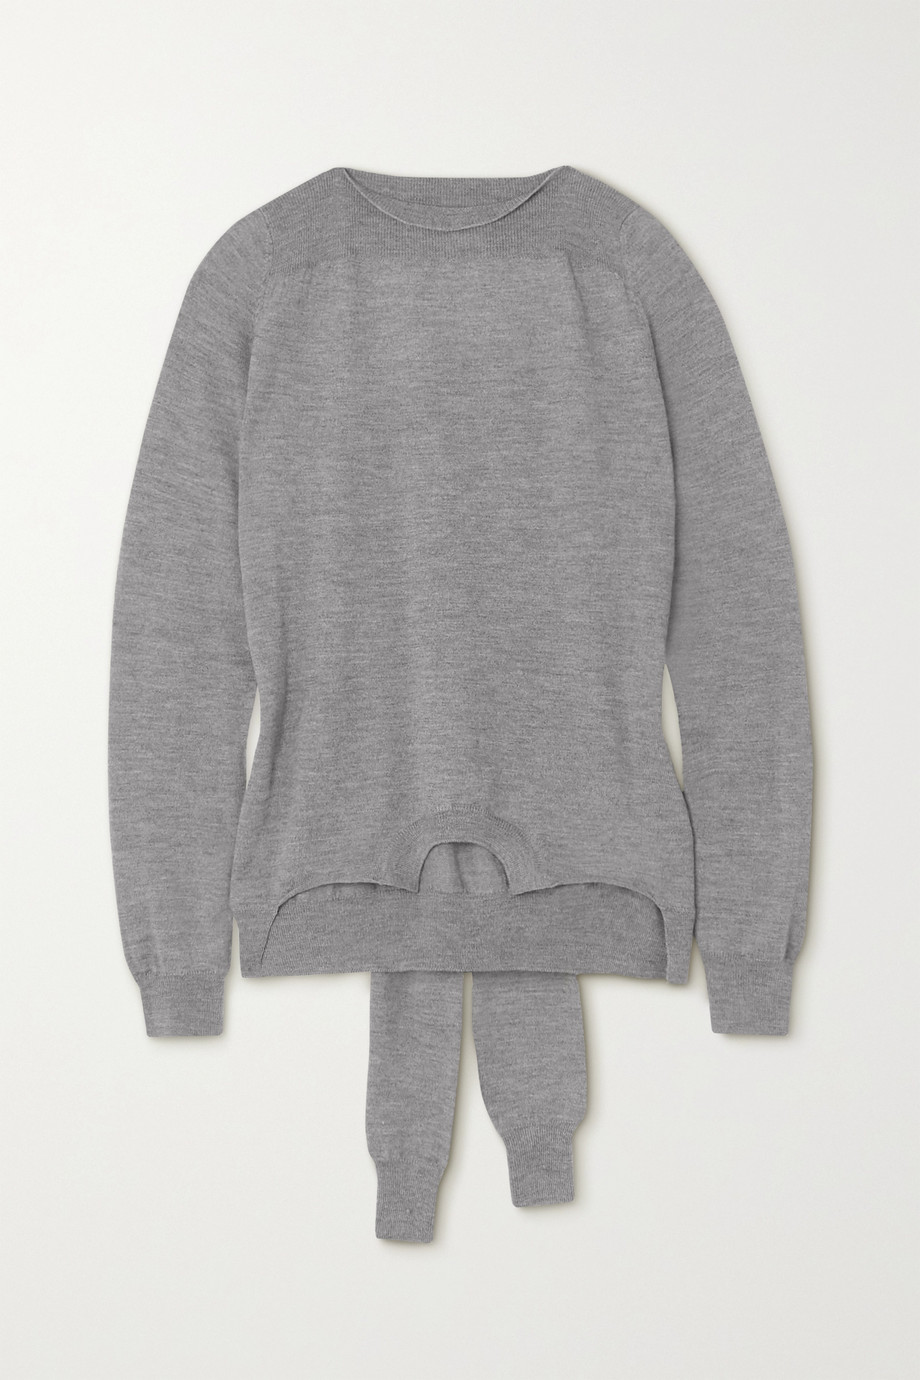 MM6 Maison Margiela Tie-detailed mélange wool sweater